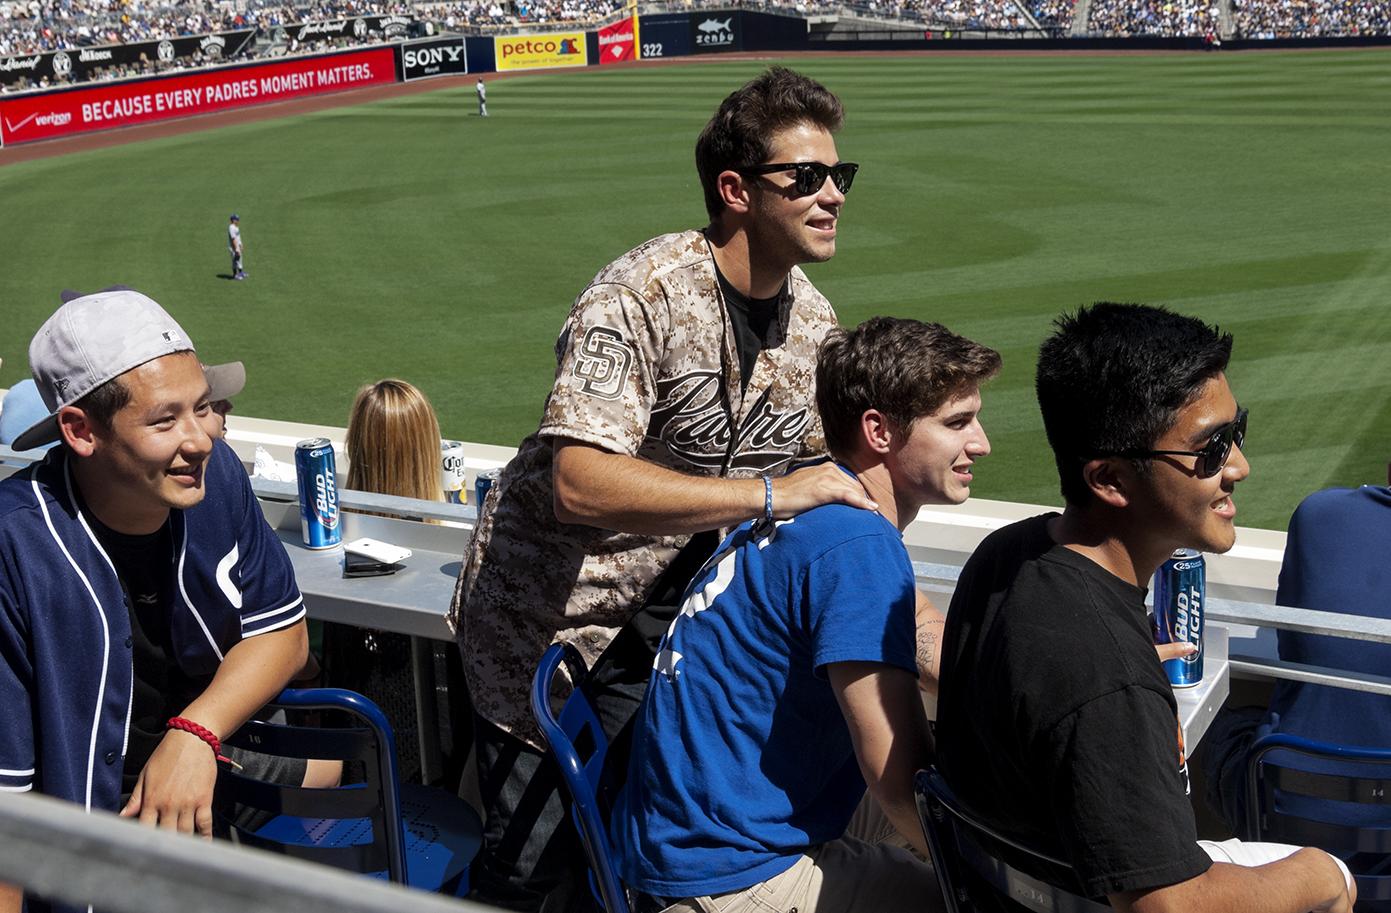 Padres_Dodgers_Apr26_2015_0481